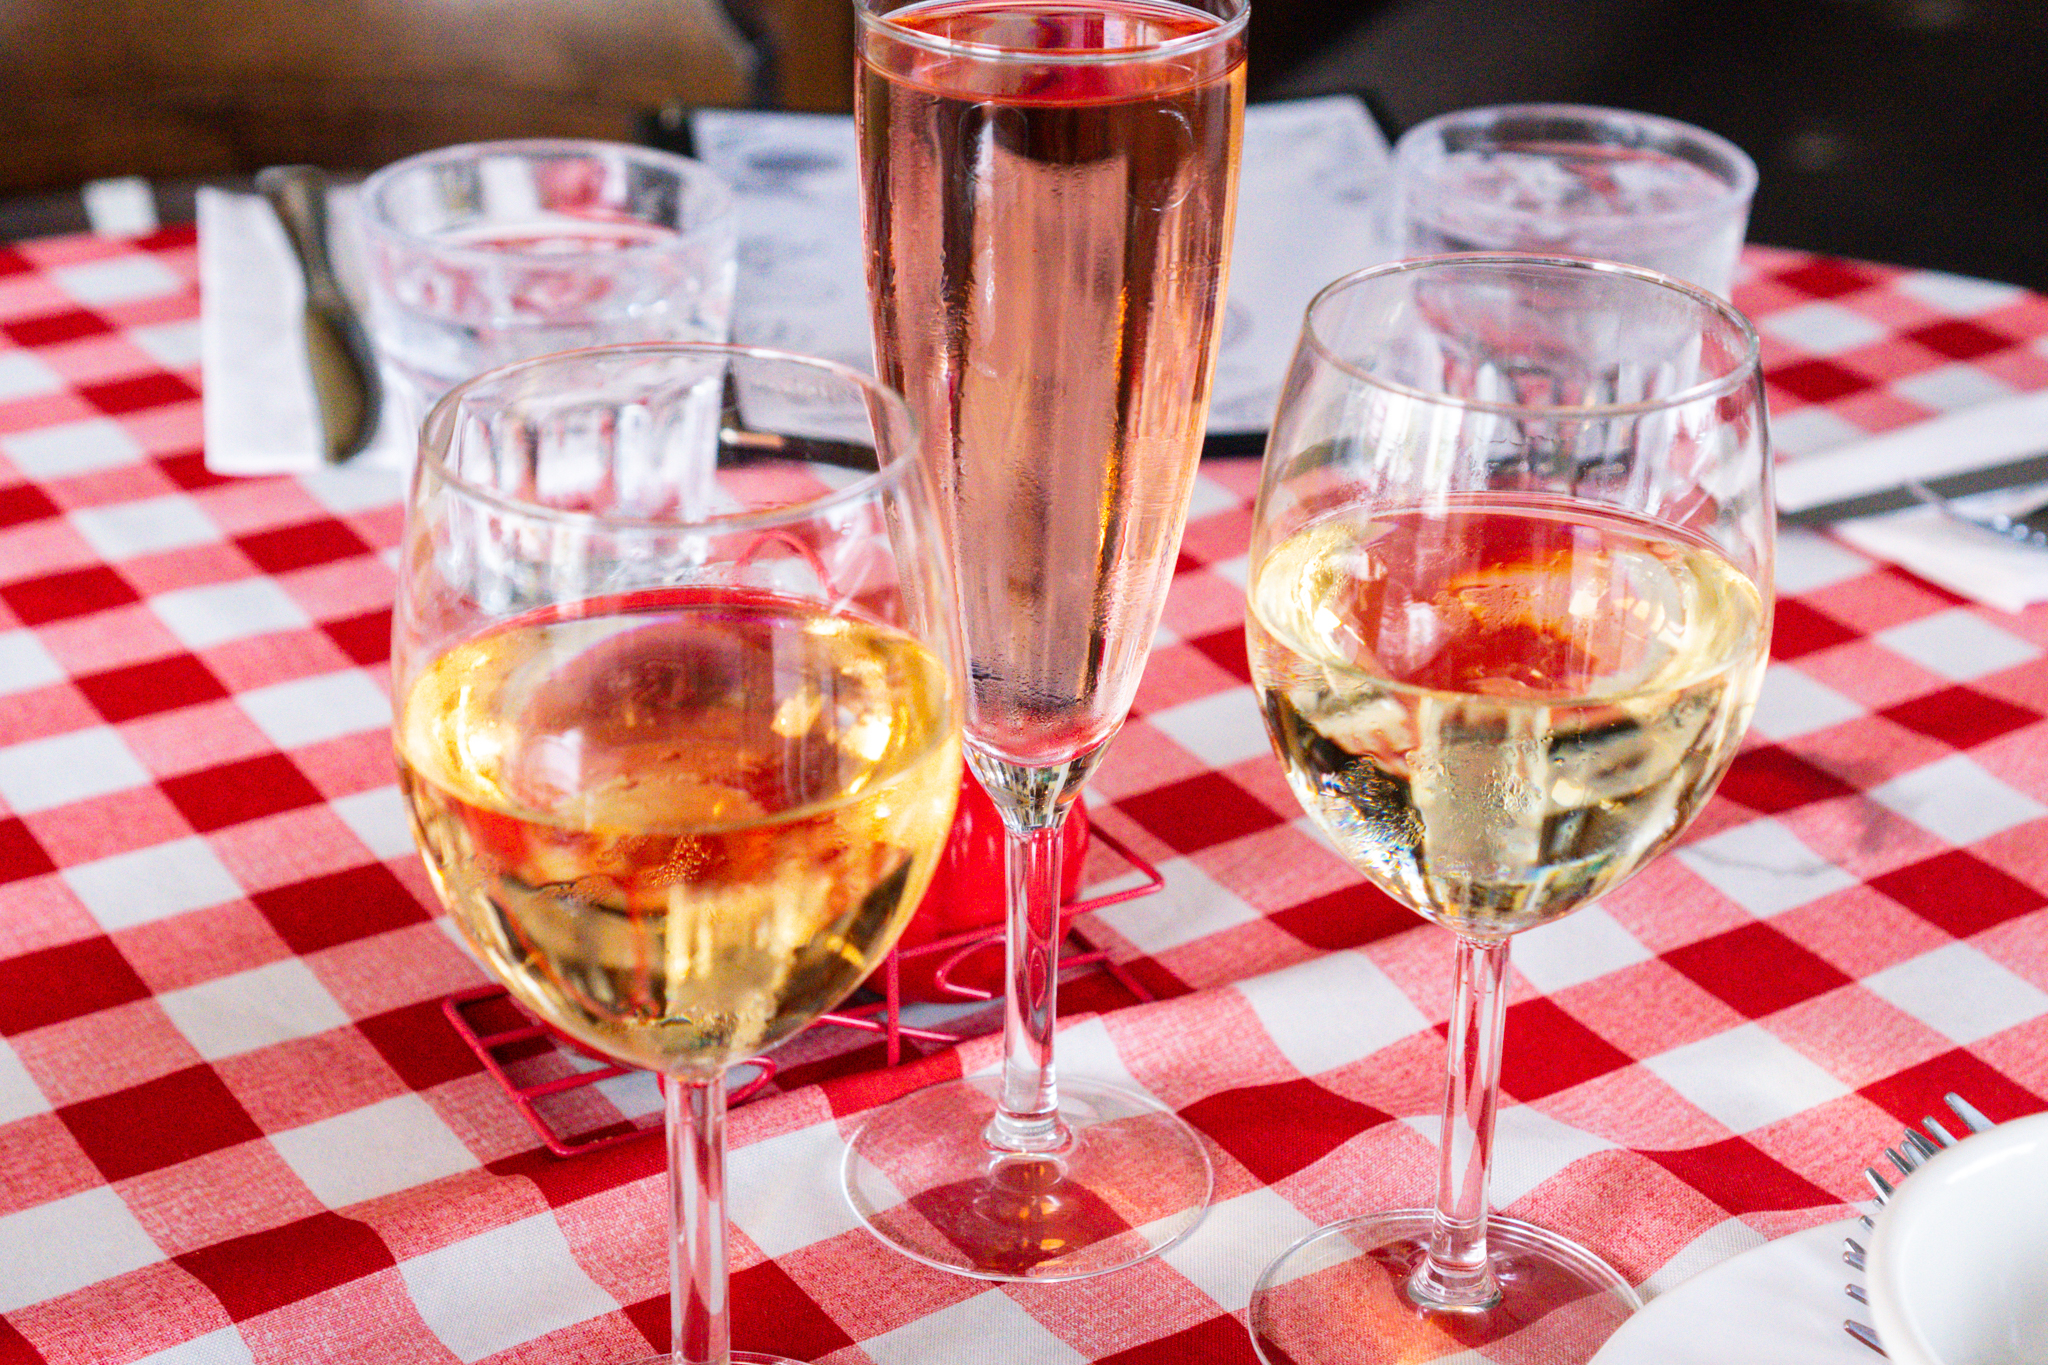 Alsace Pinot Gris d'Alace, Poinsettia, Sauvignon Blanc